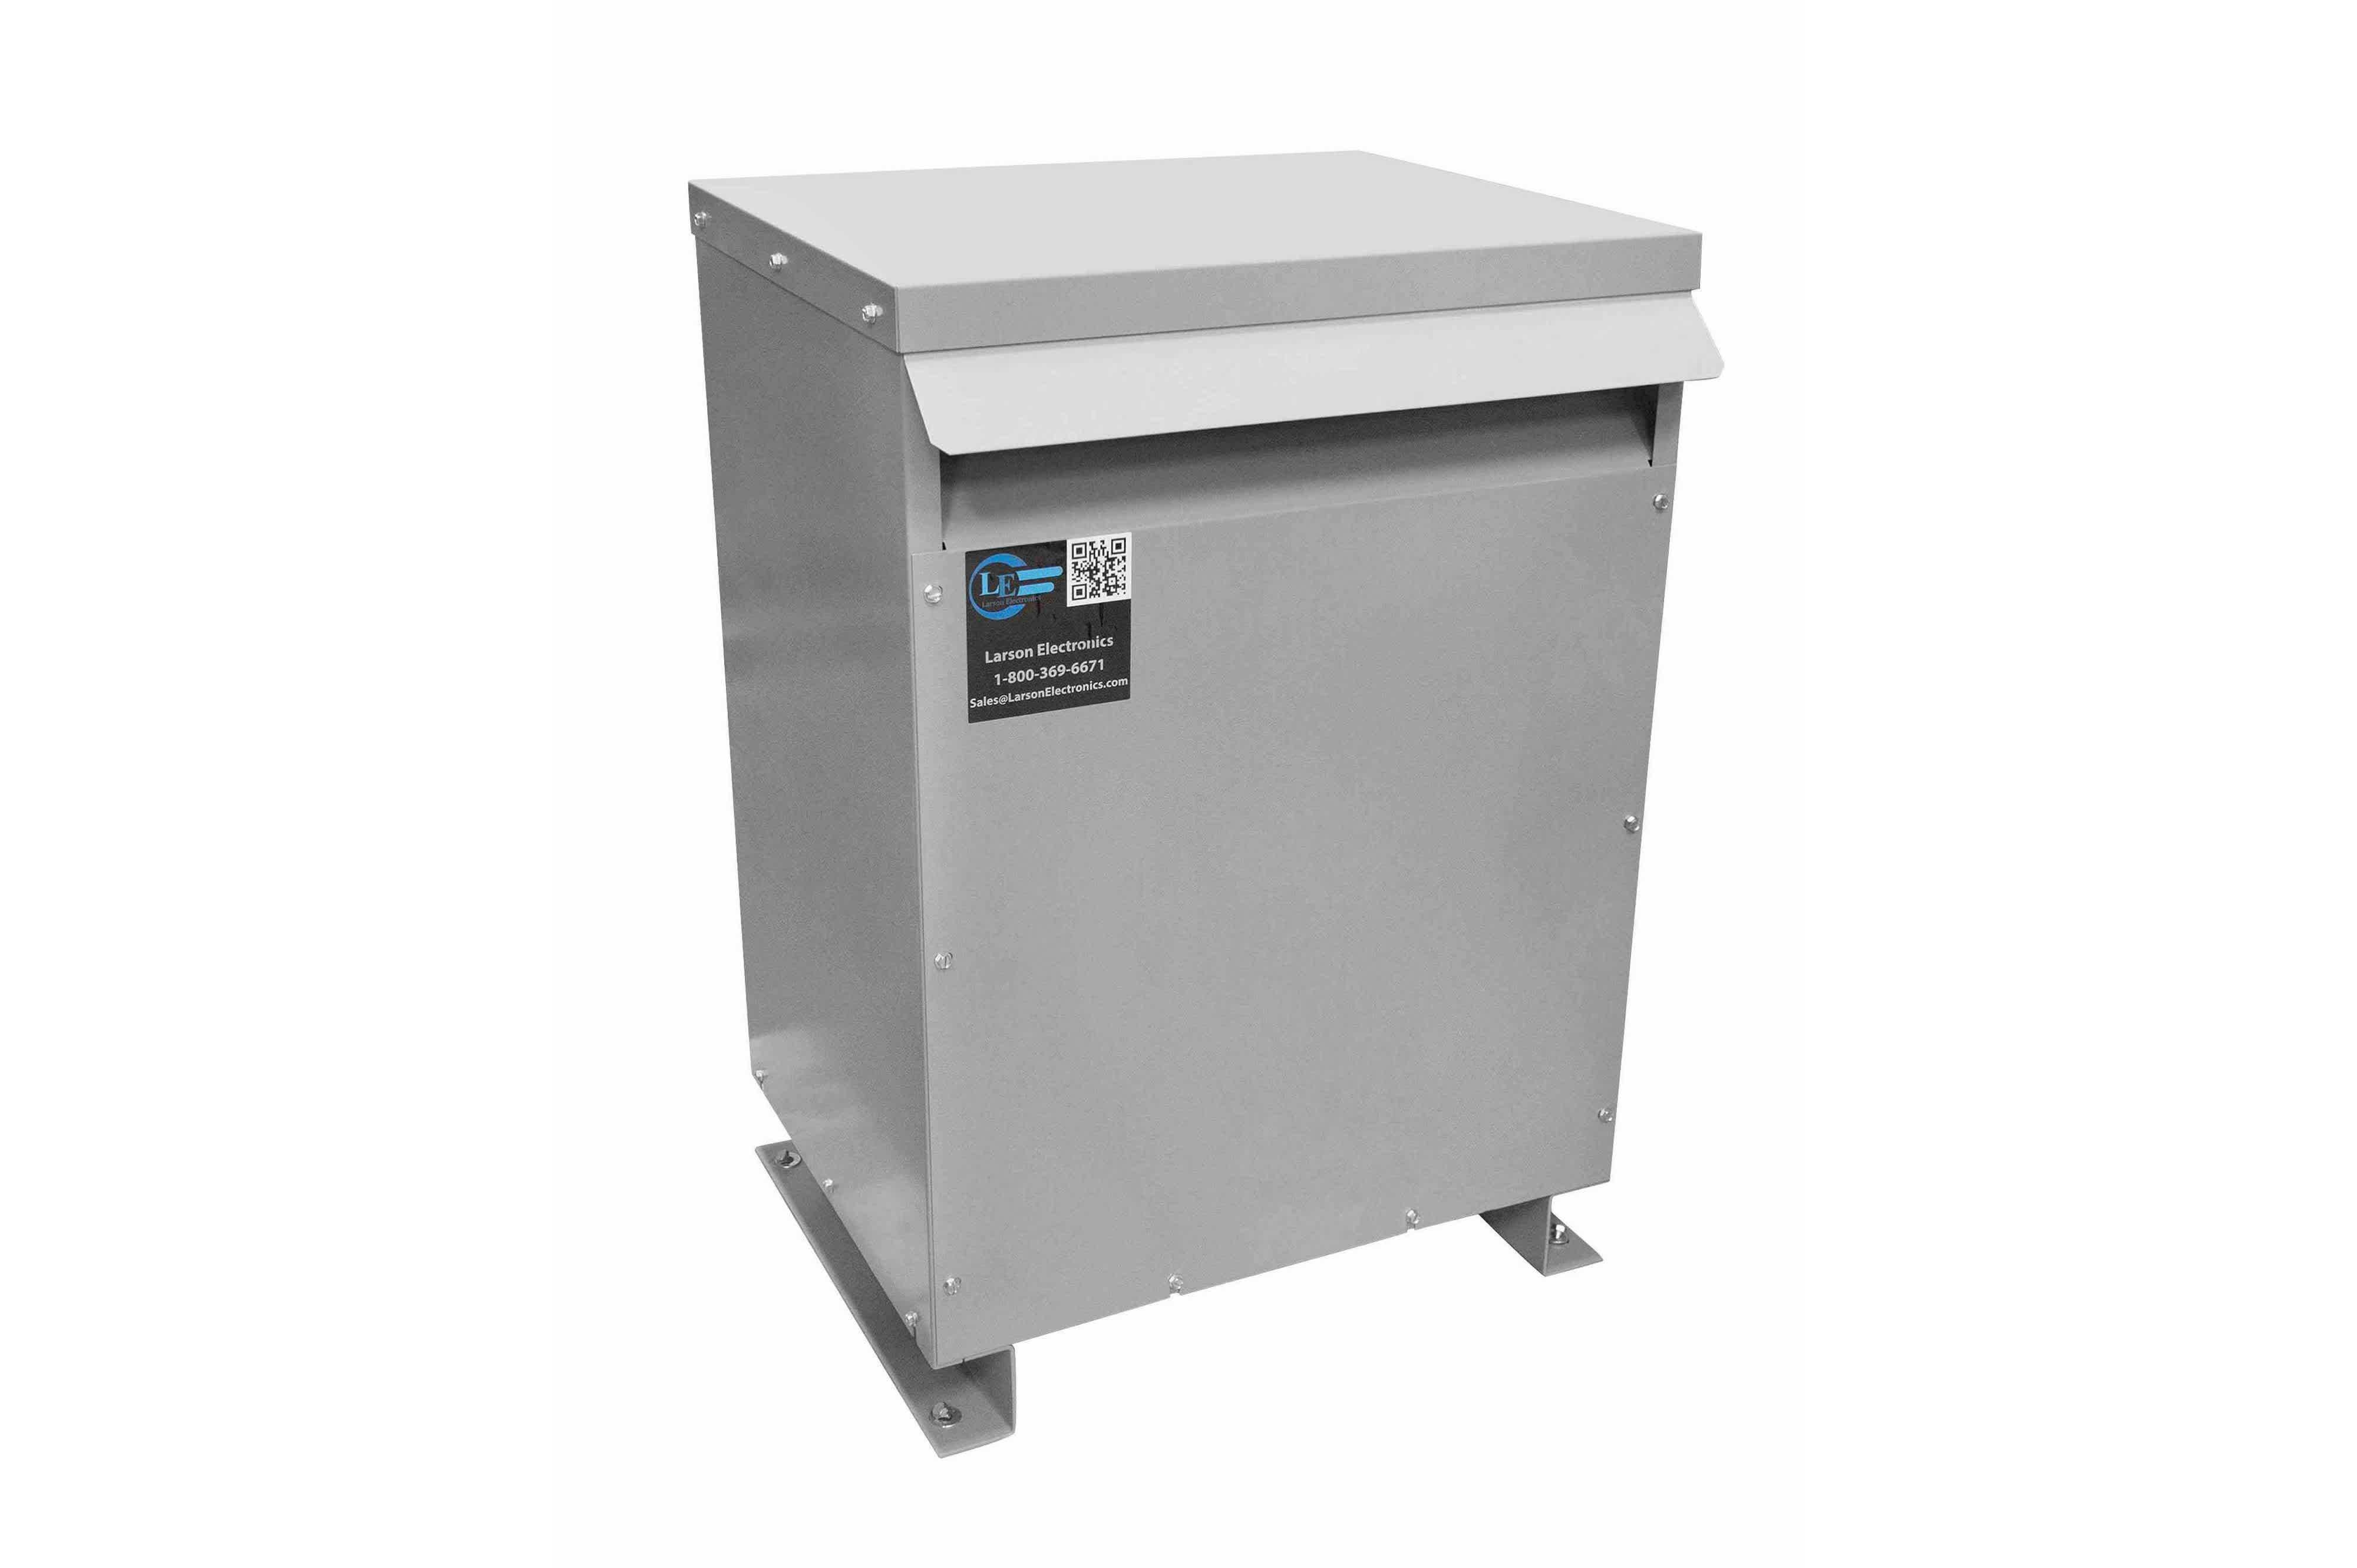 1000 kVA 3PH Isolation Transformer, 480V Wye Primary, 240V/120 Delta Secondary, N3R, Ventilated, 60 Hz